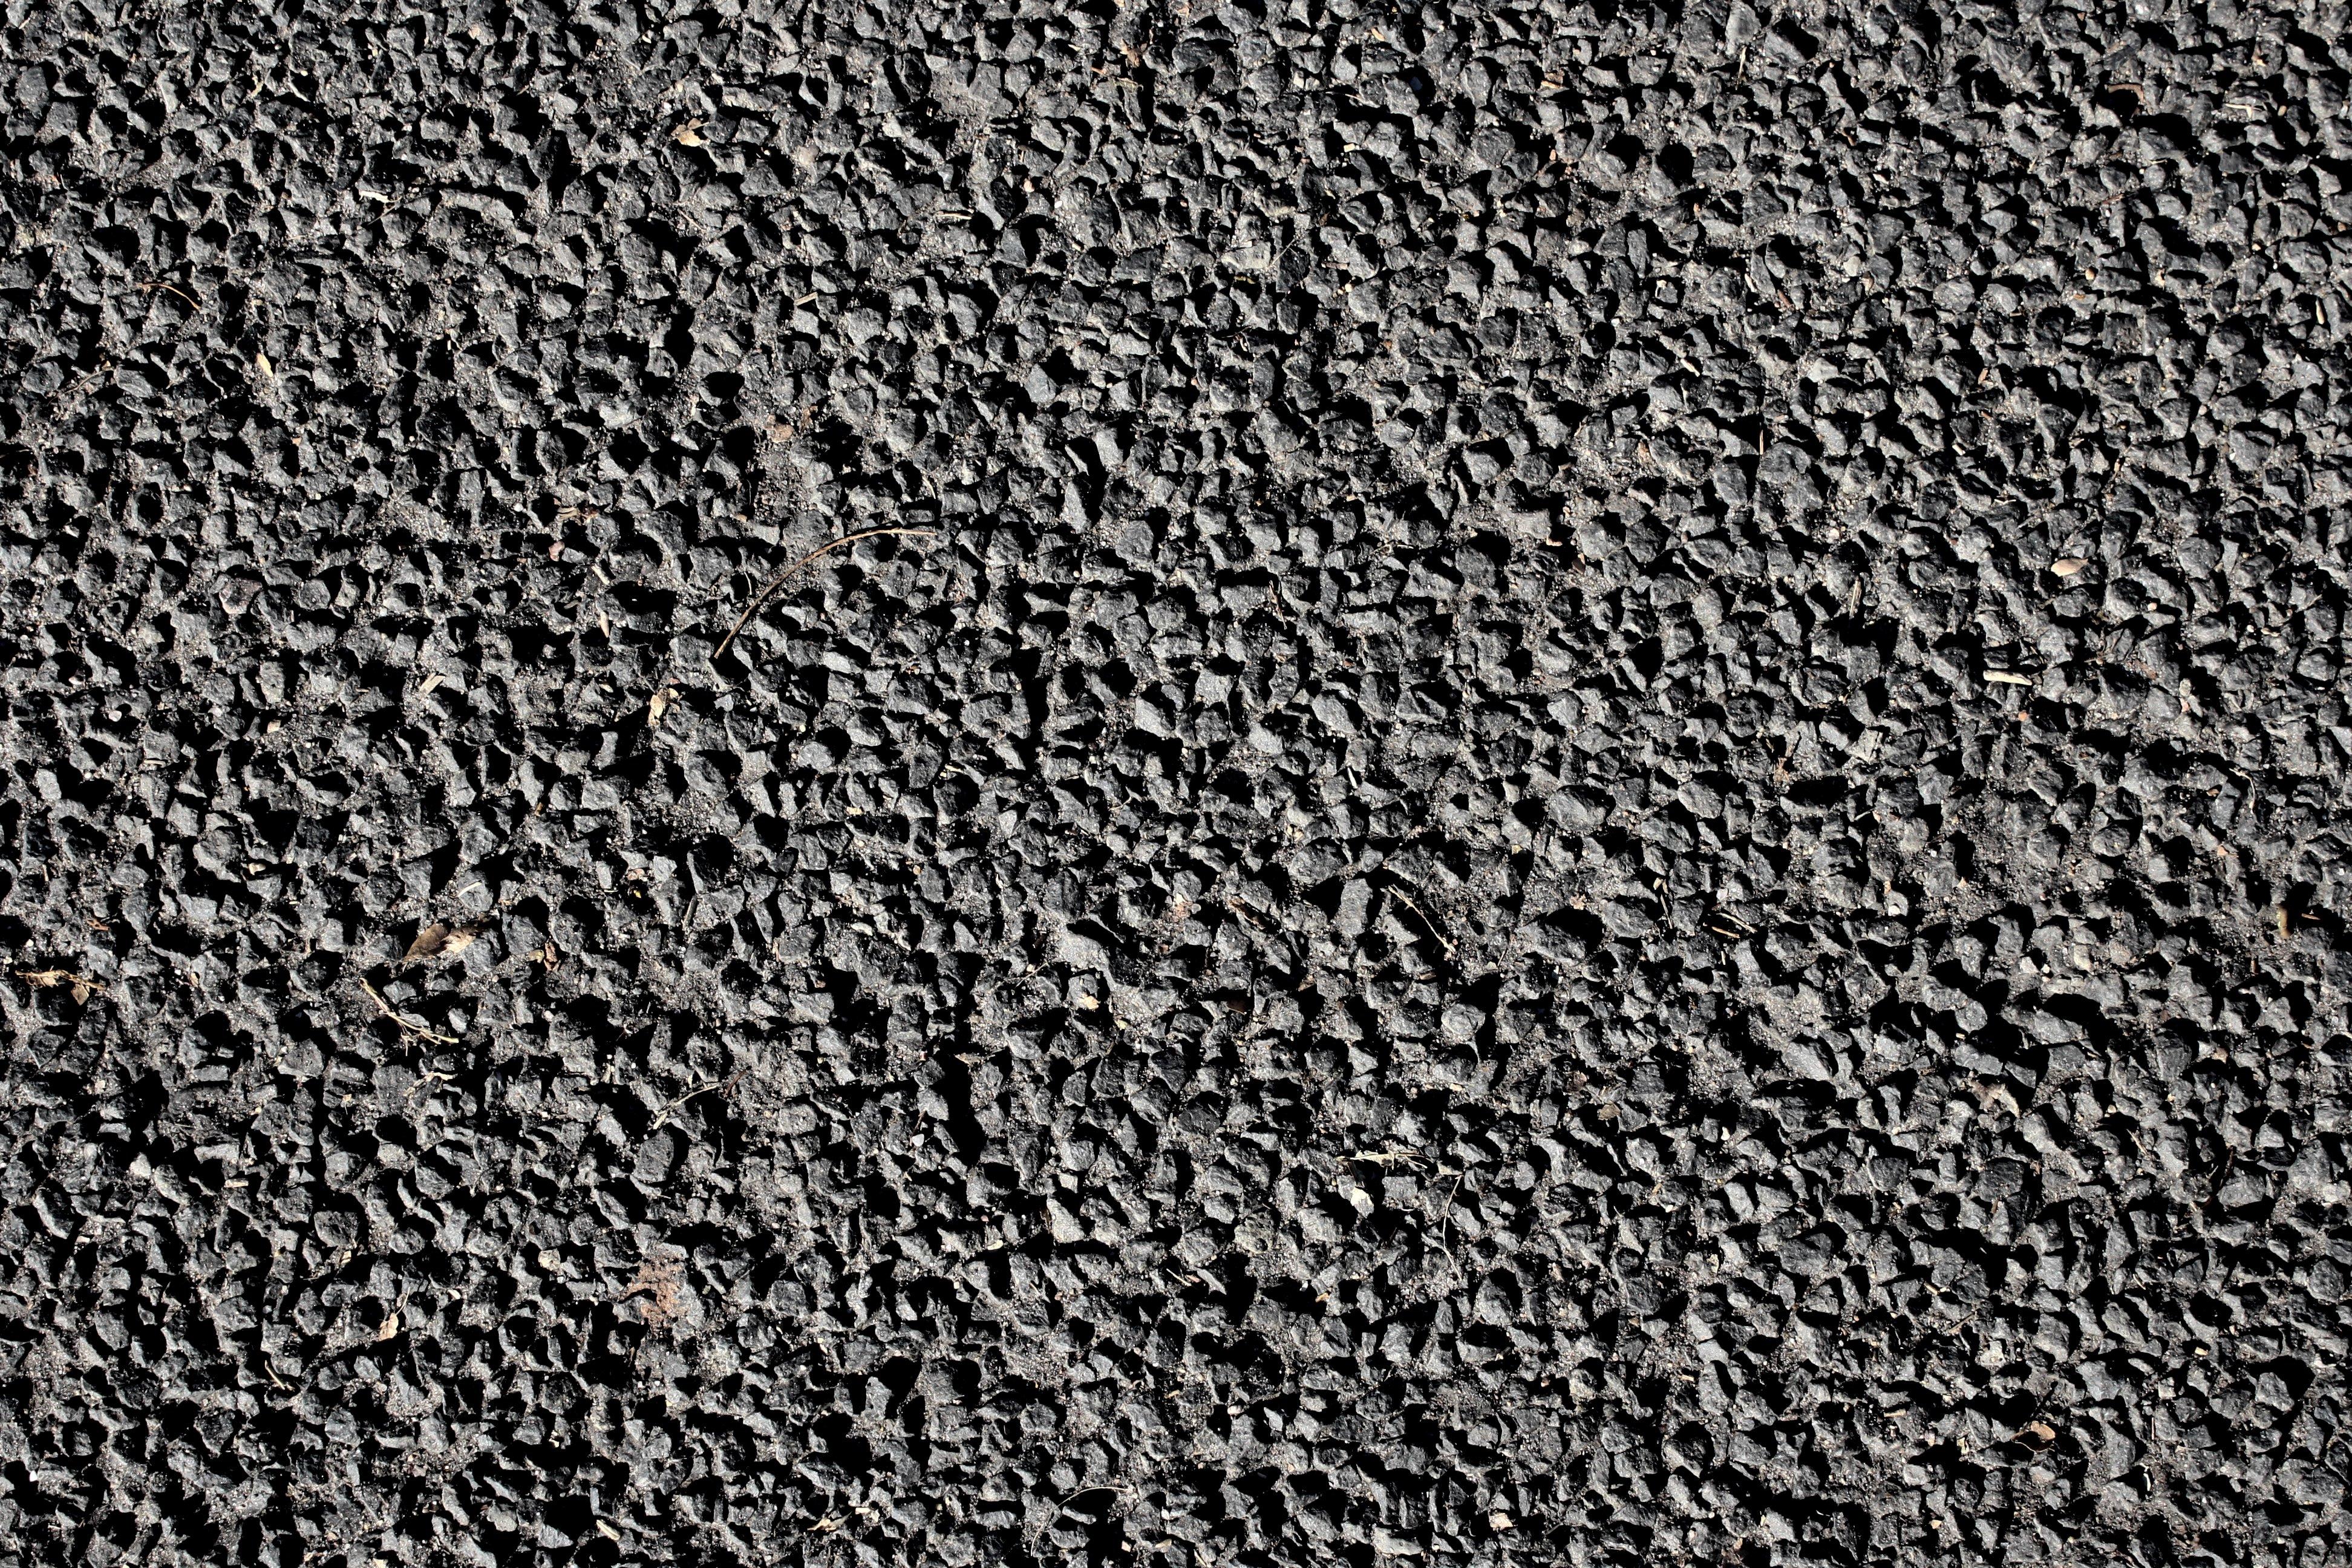 Black Gravel Texture Picture.